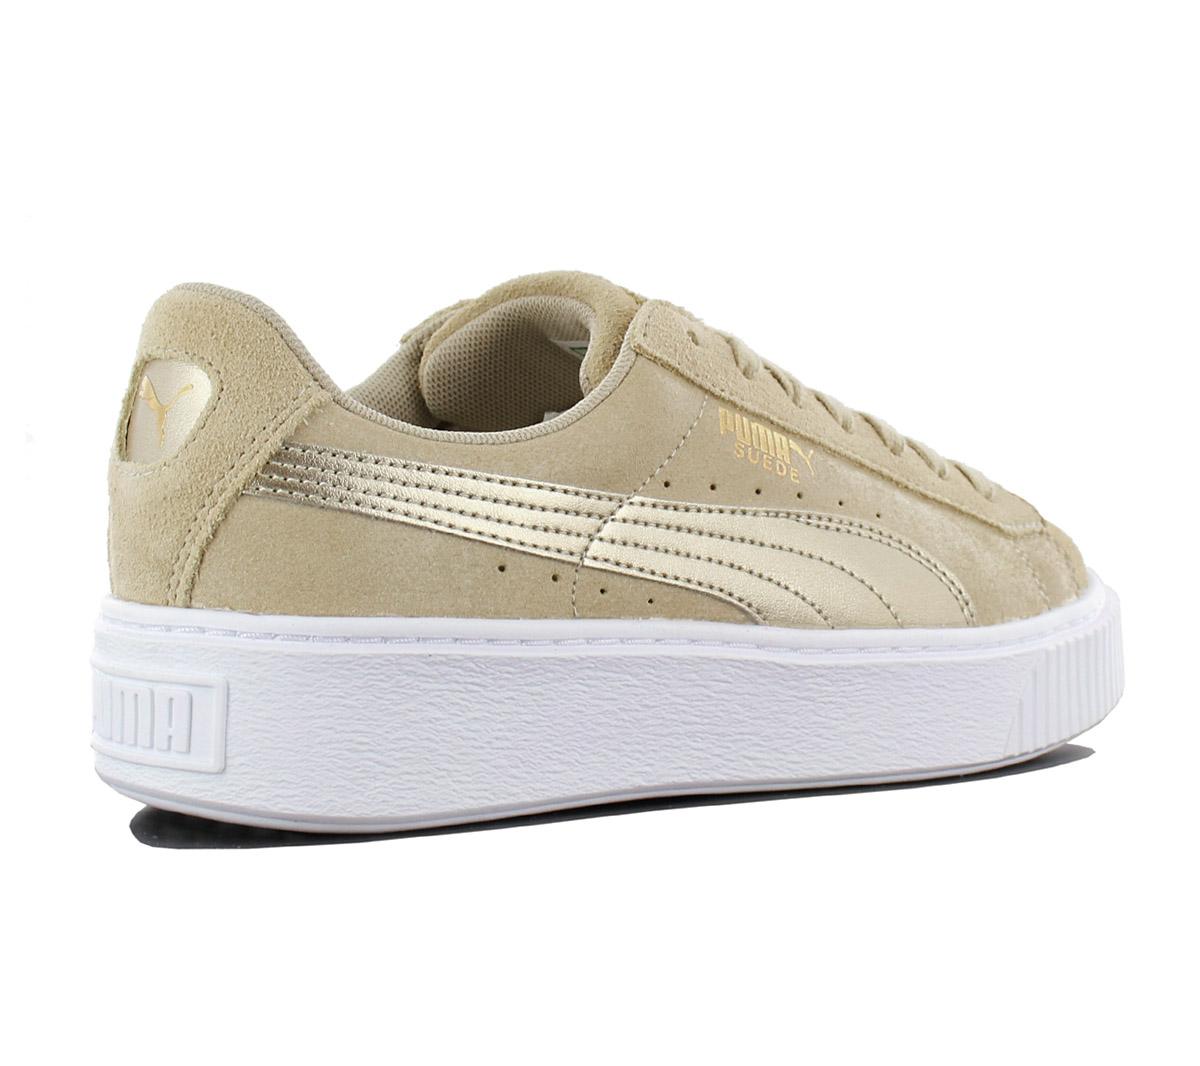 Details zu Puma Suede Platform Safari Damen Sneaker Leder Schuhe 364594 01 Beige Turnschuhe